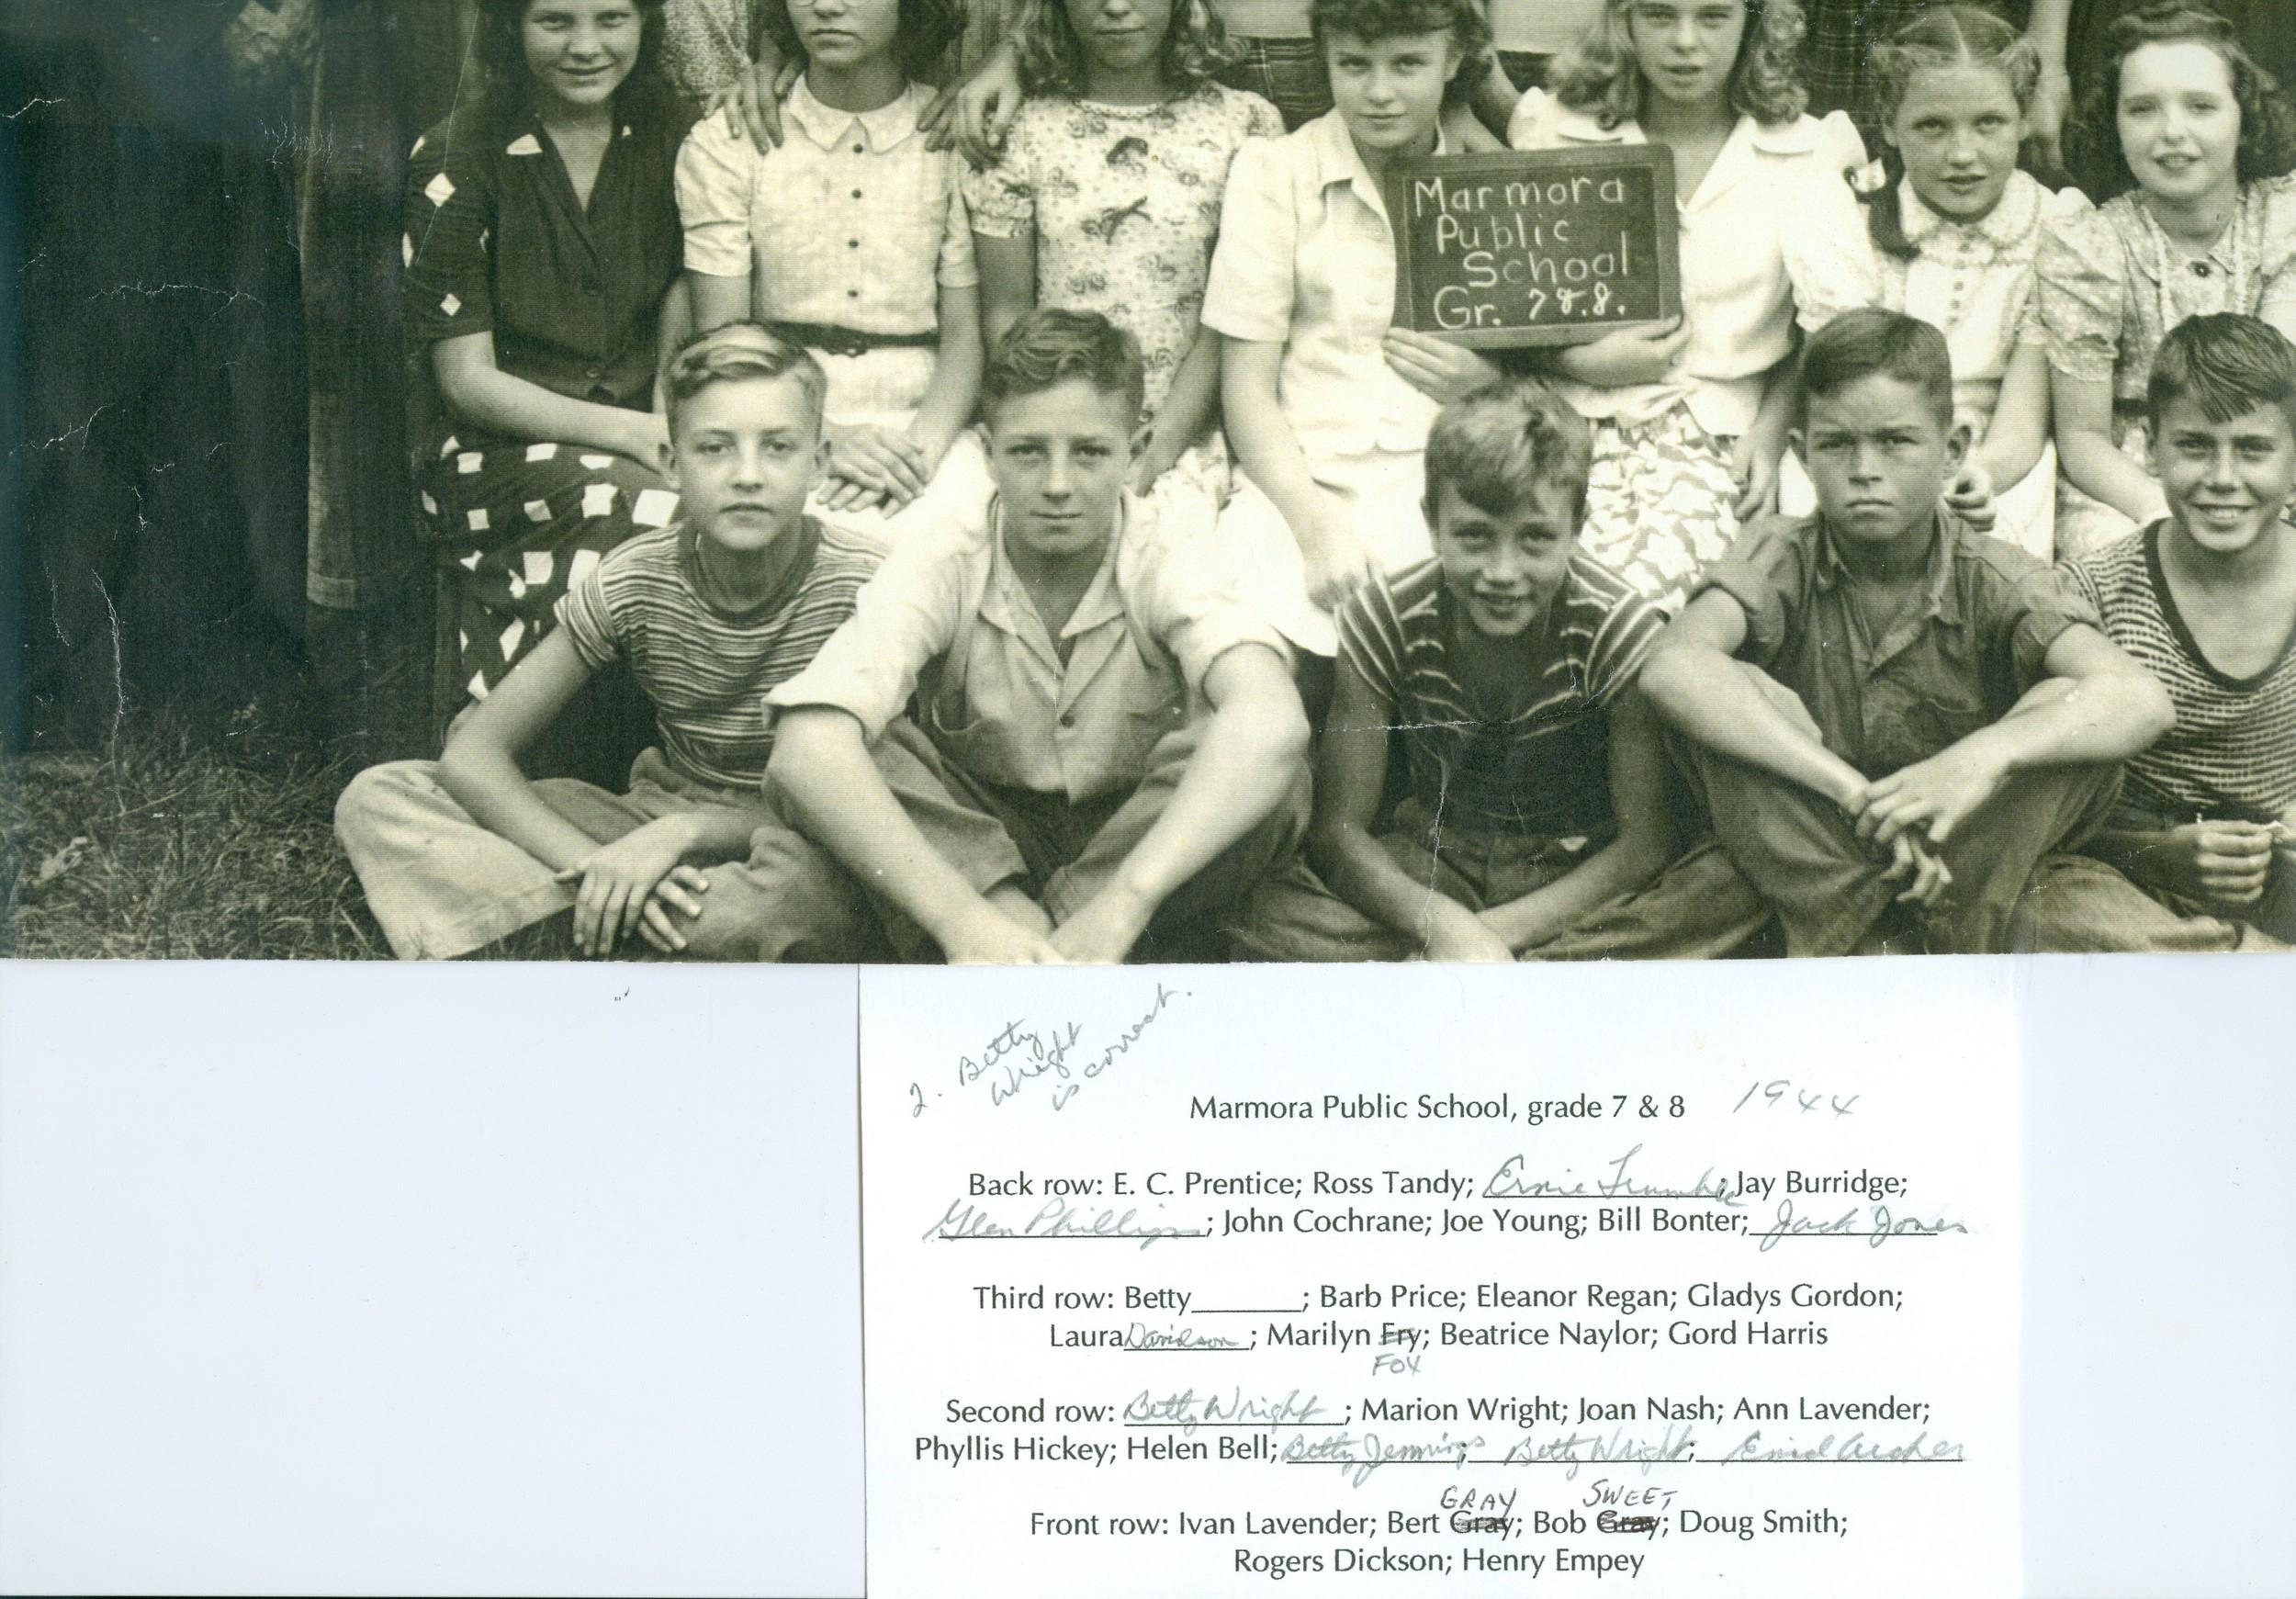 Marmora Public School 1944 Grade 7 & 8 (ID card).jpg